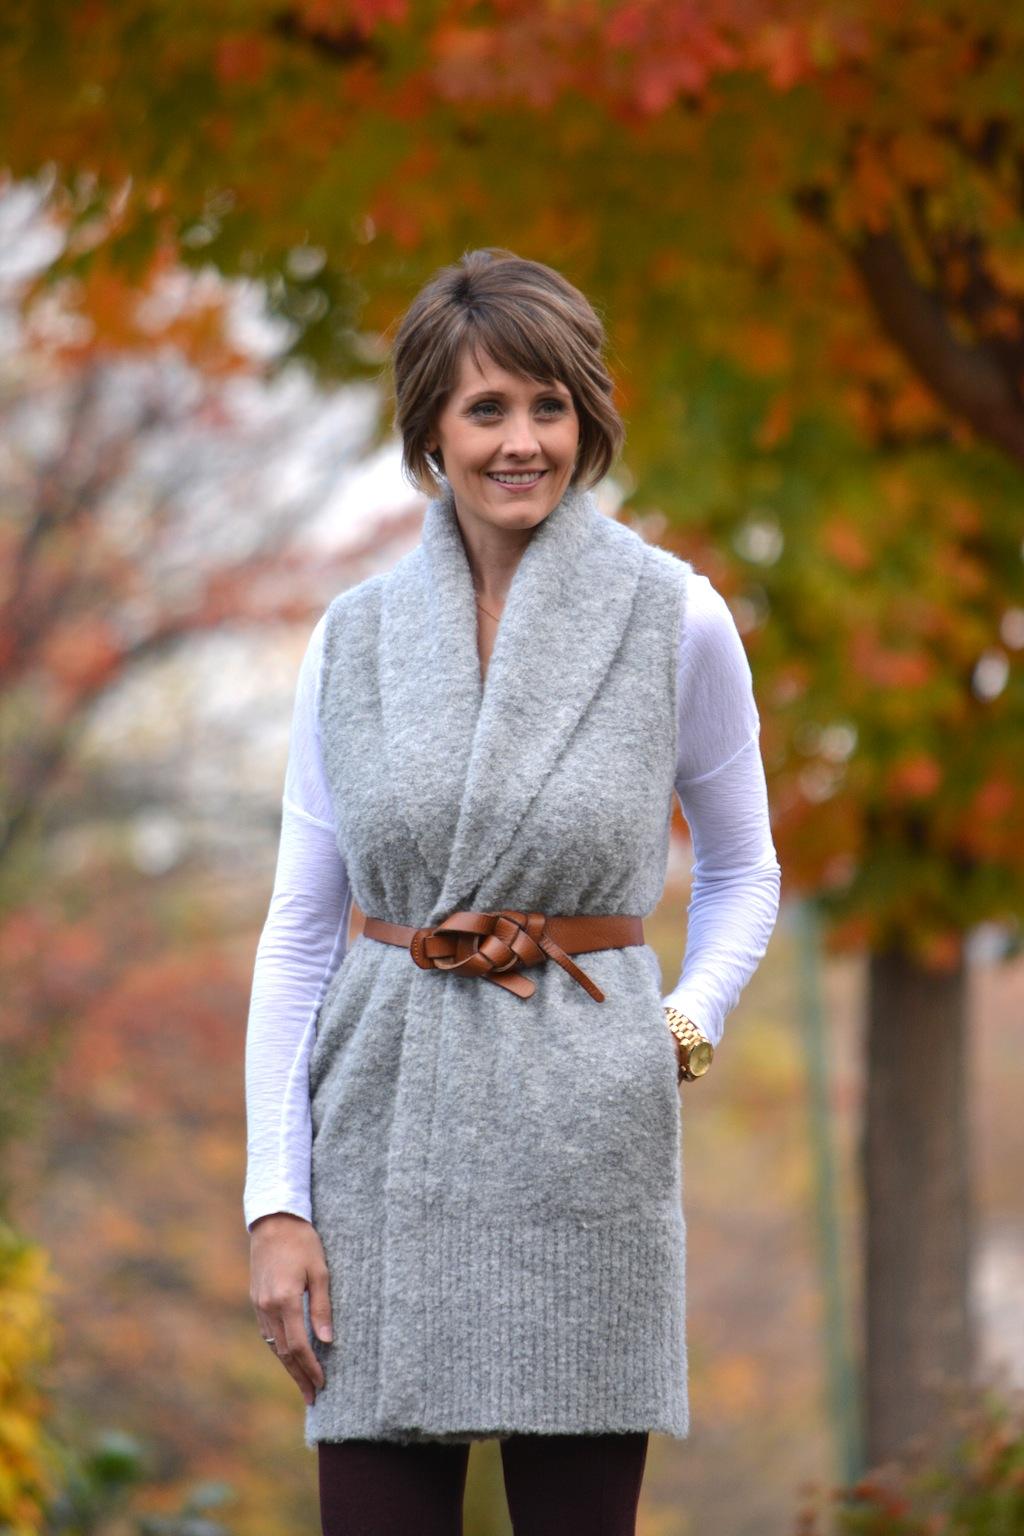 greysweatervest4